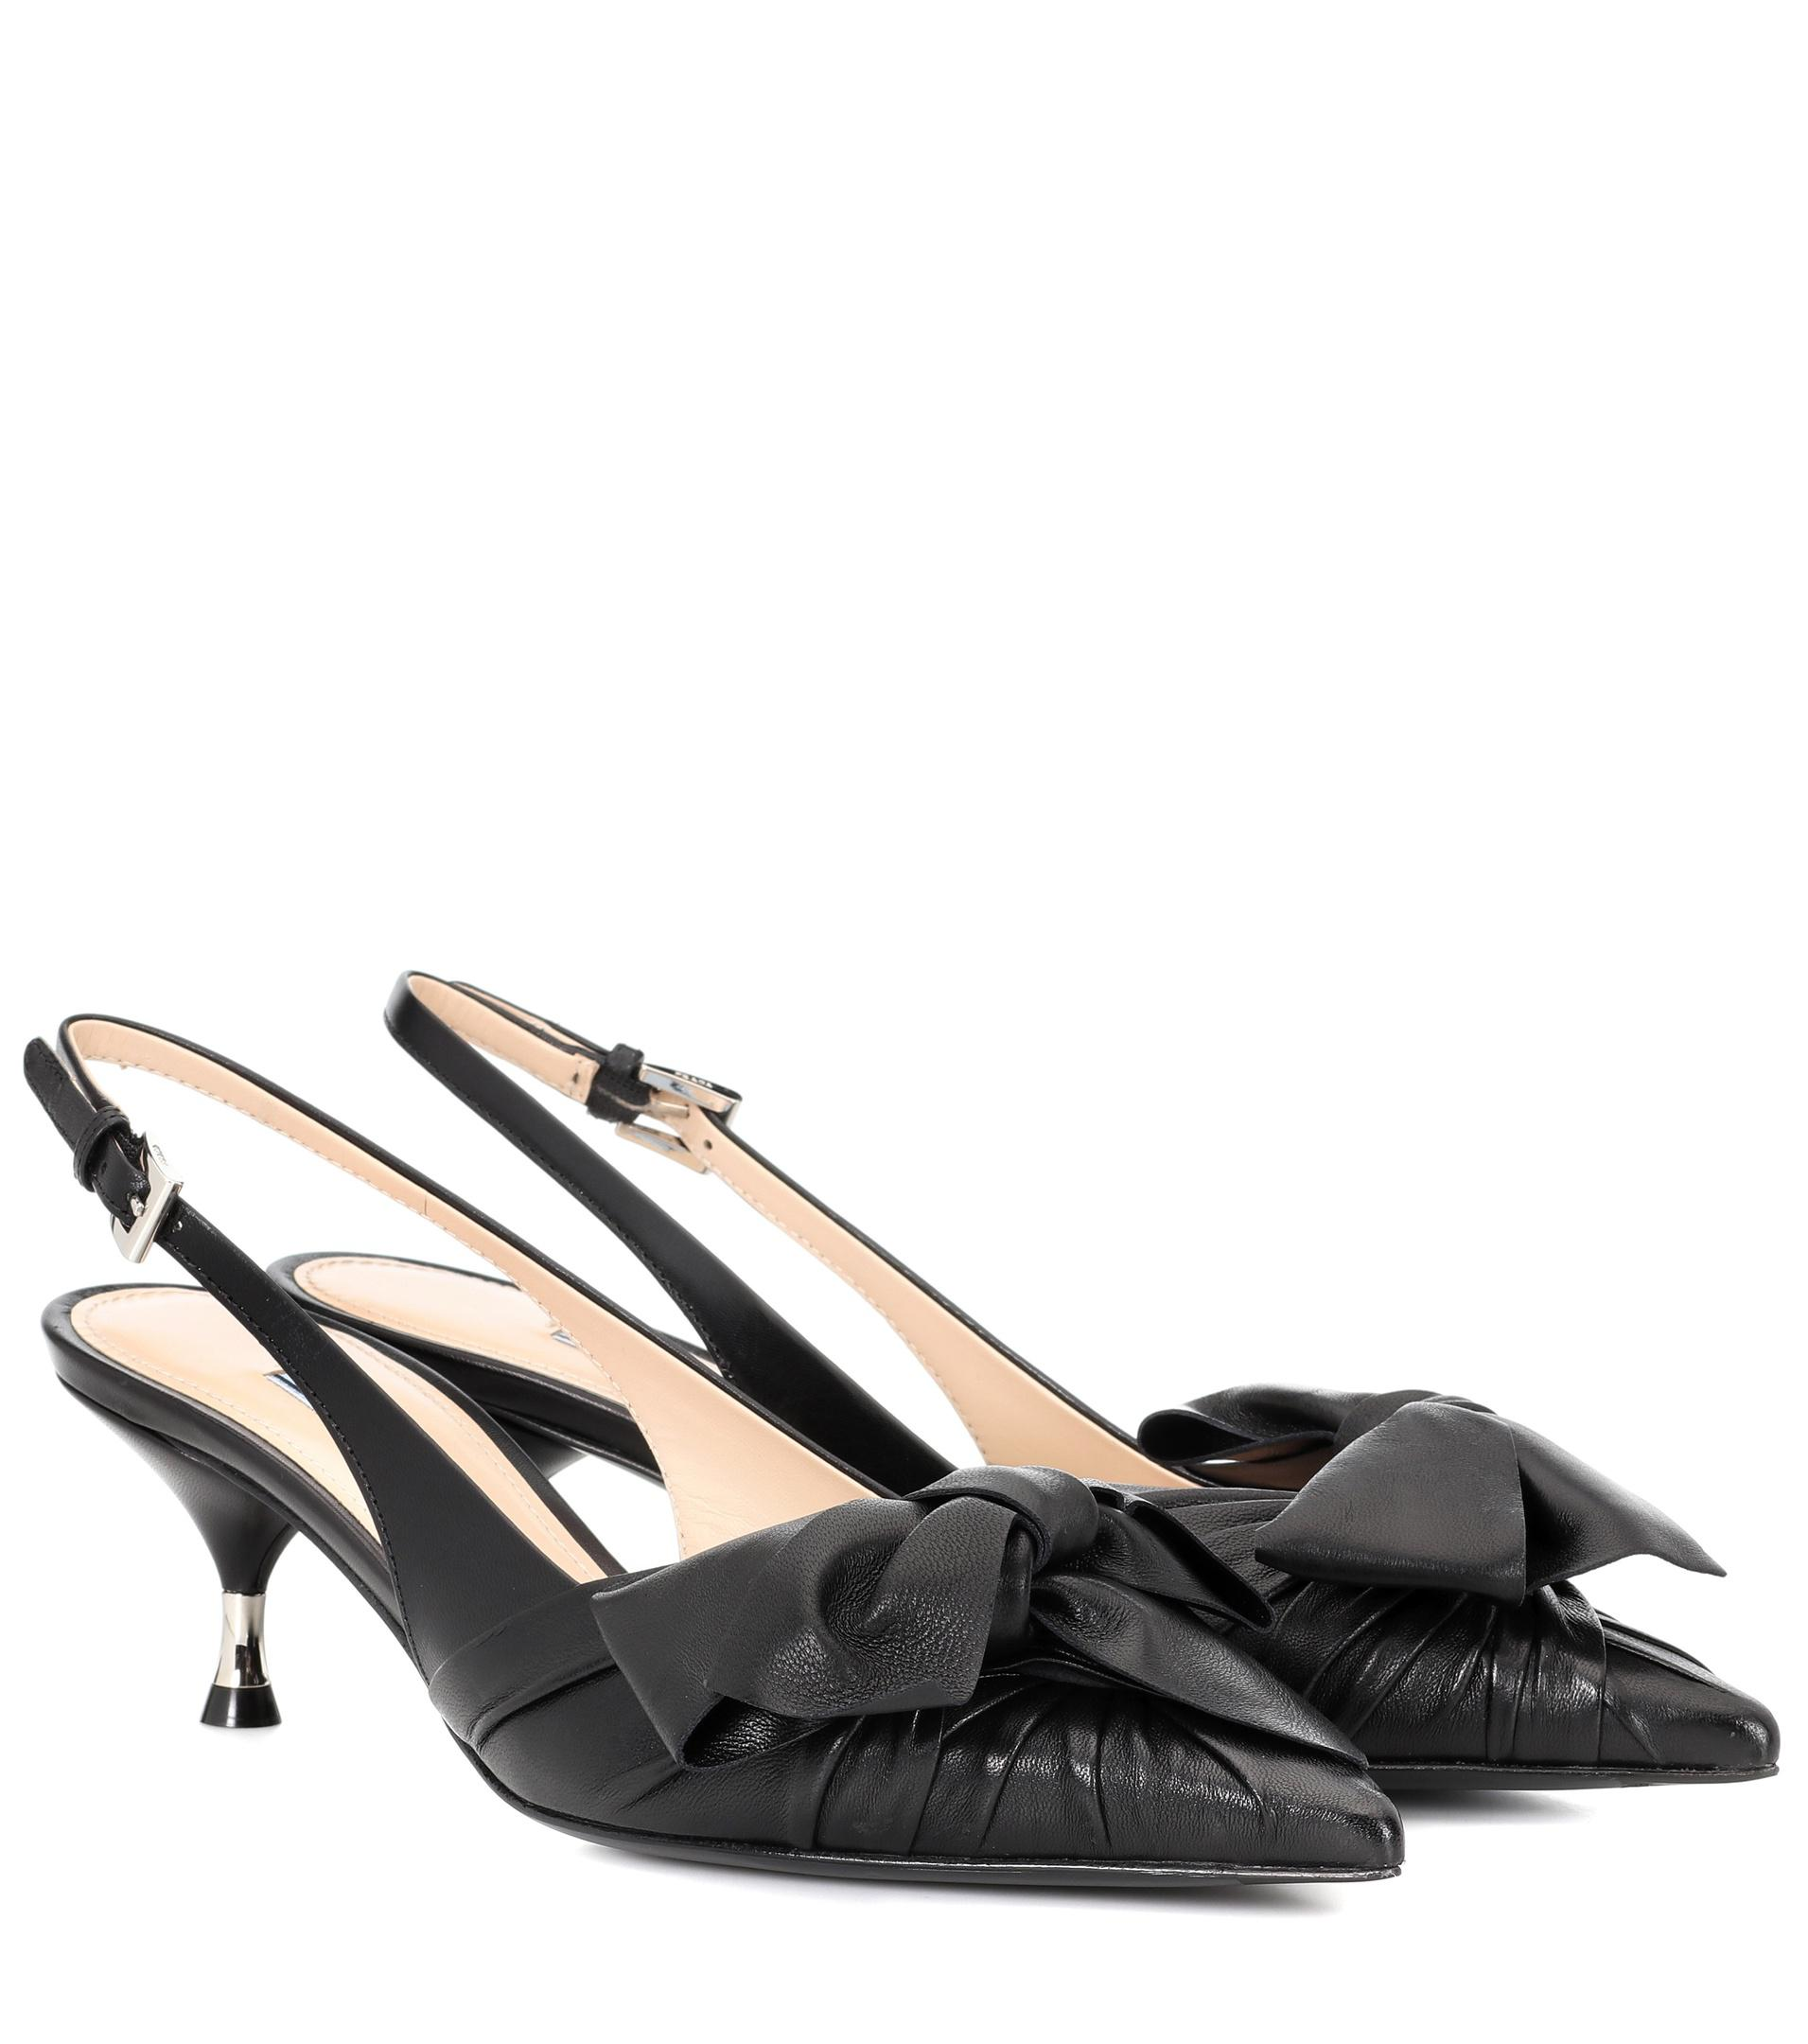 cc0d25df7 Prada - Black Leather Bow Slingback Pumps - Lyst. View fullscreen